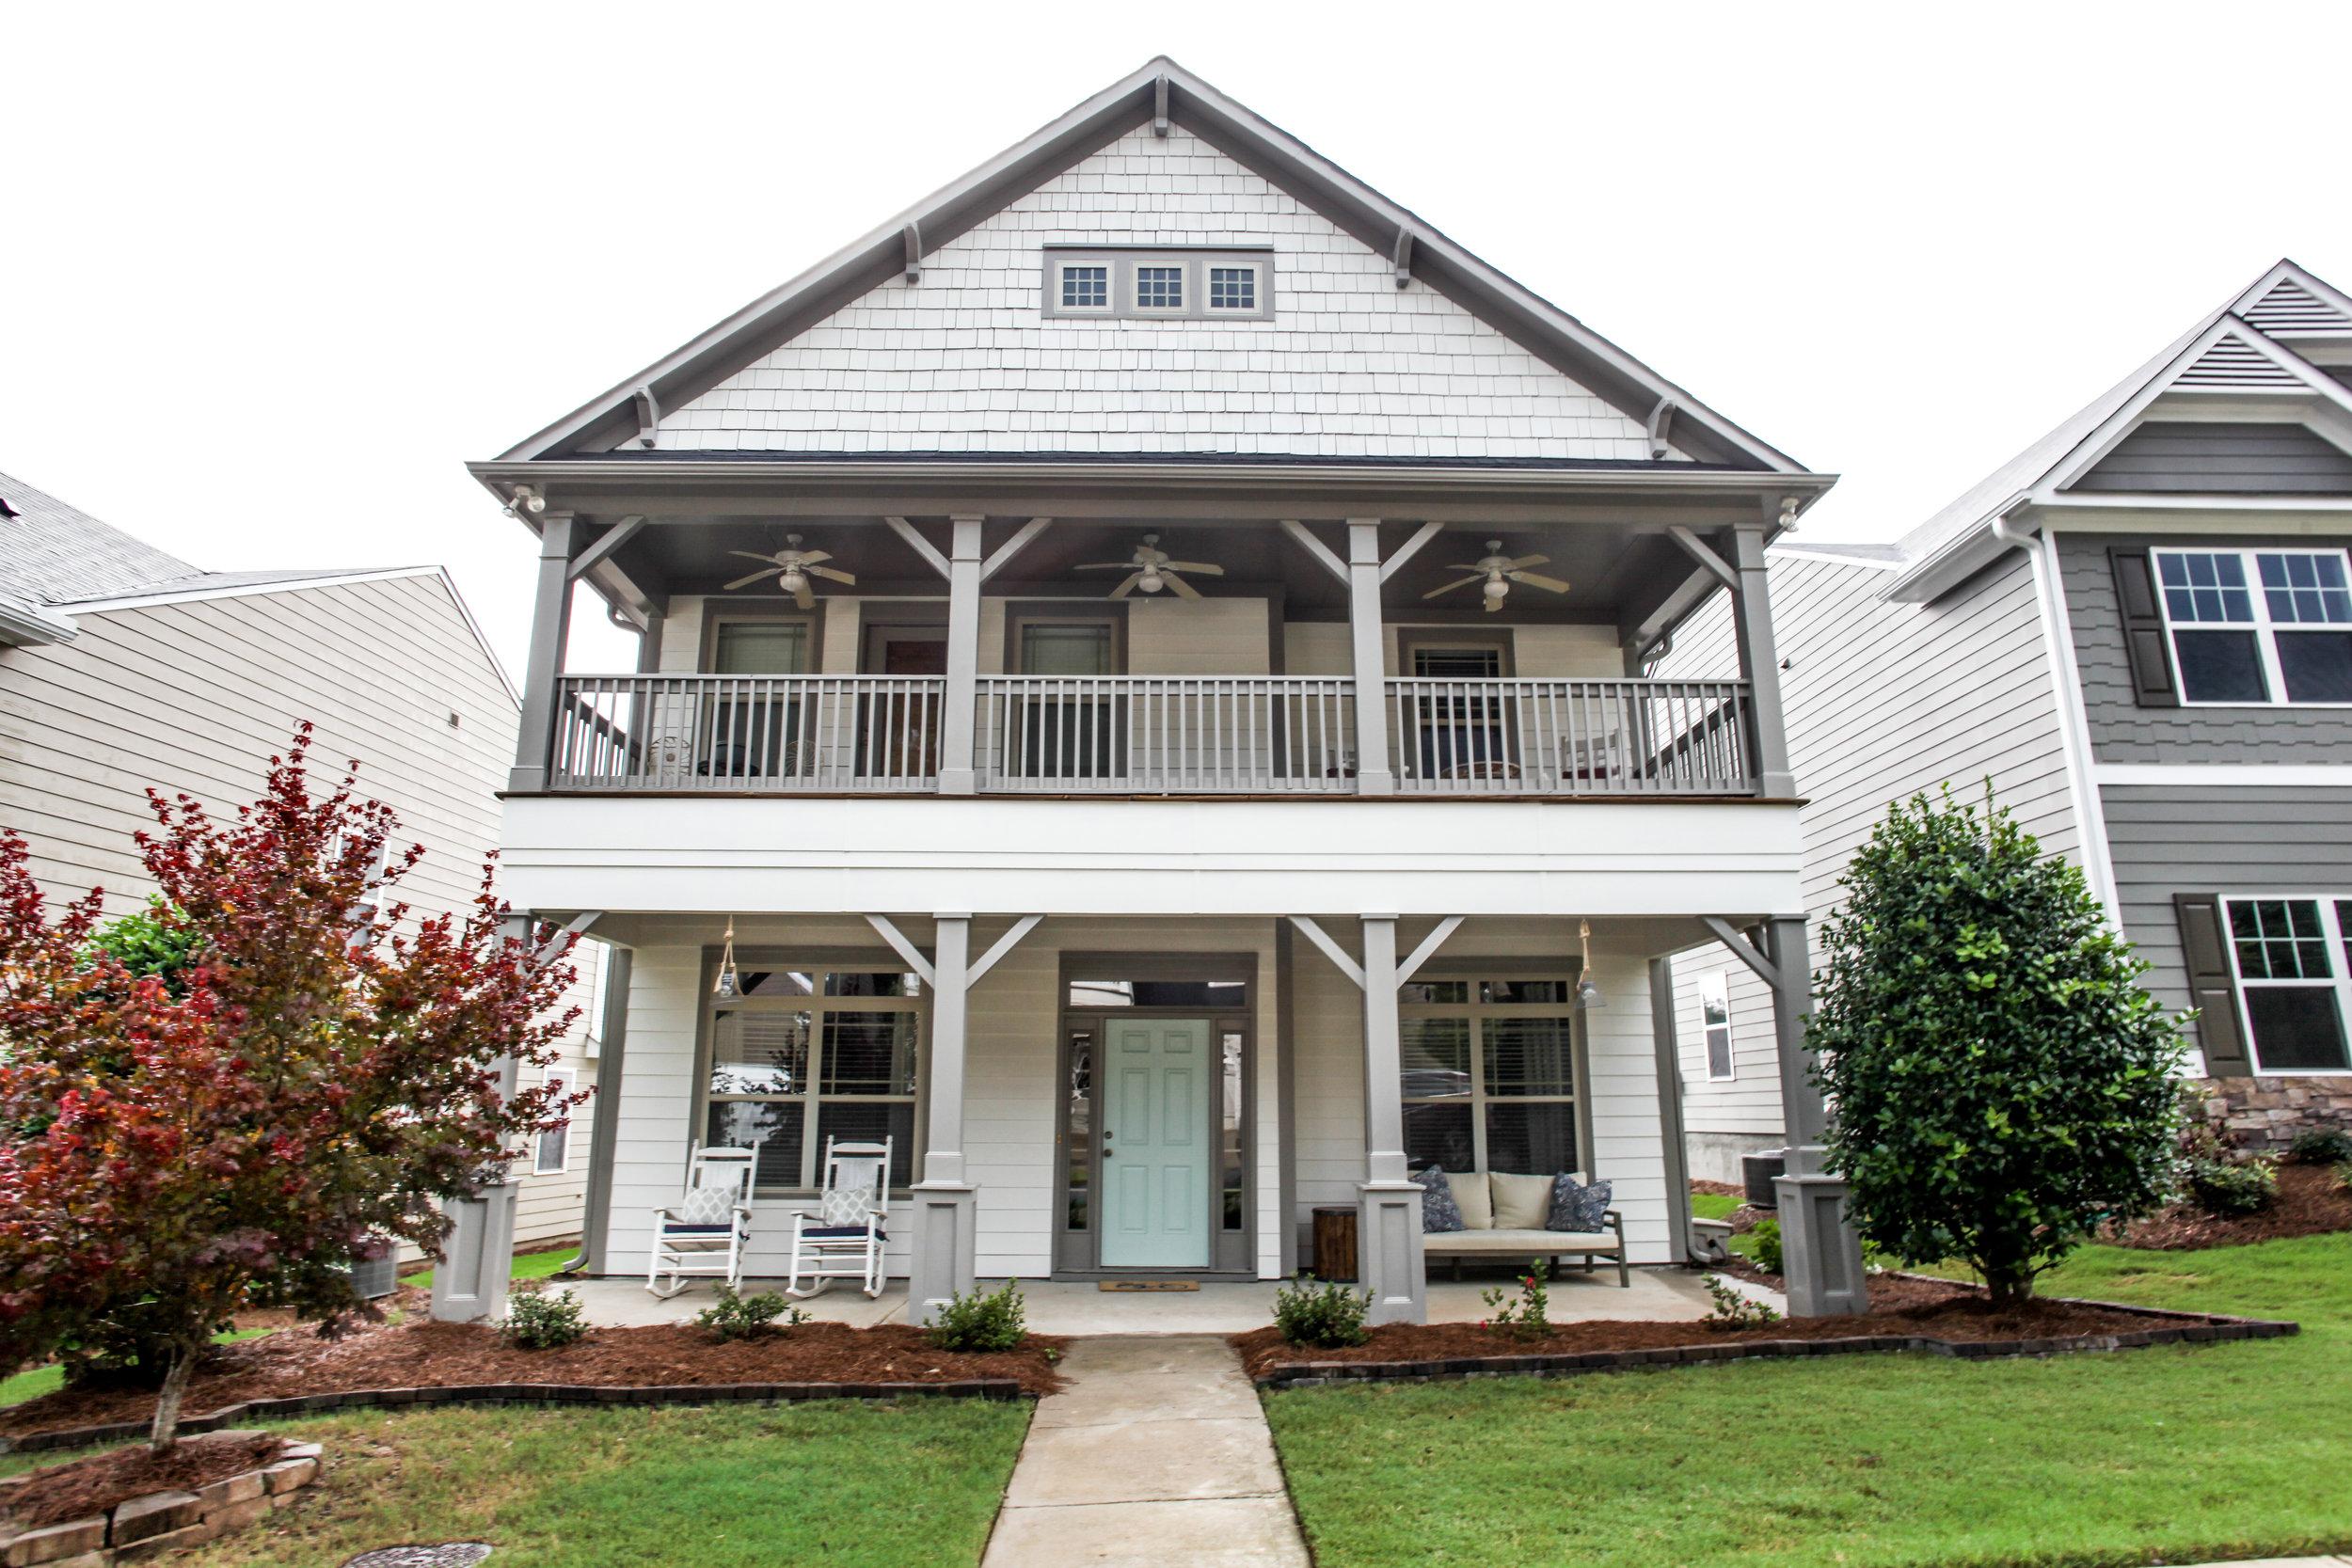 canton georgia home for sale-2.jpg